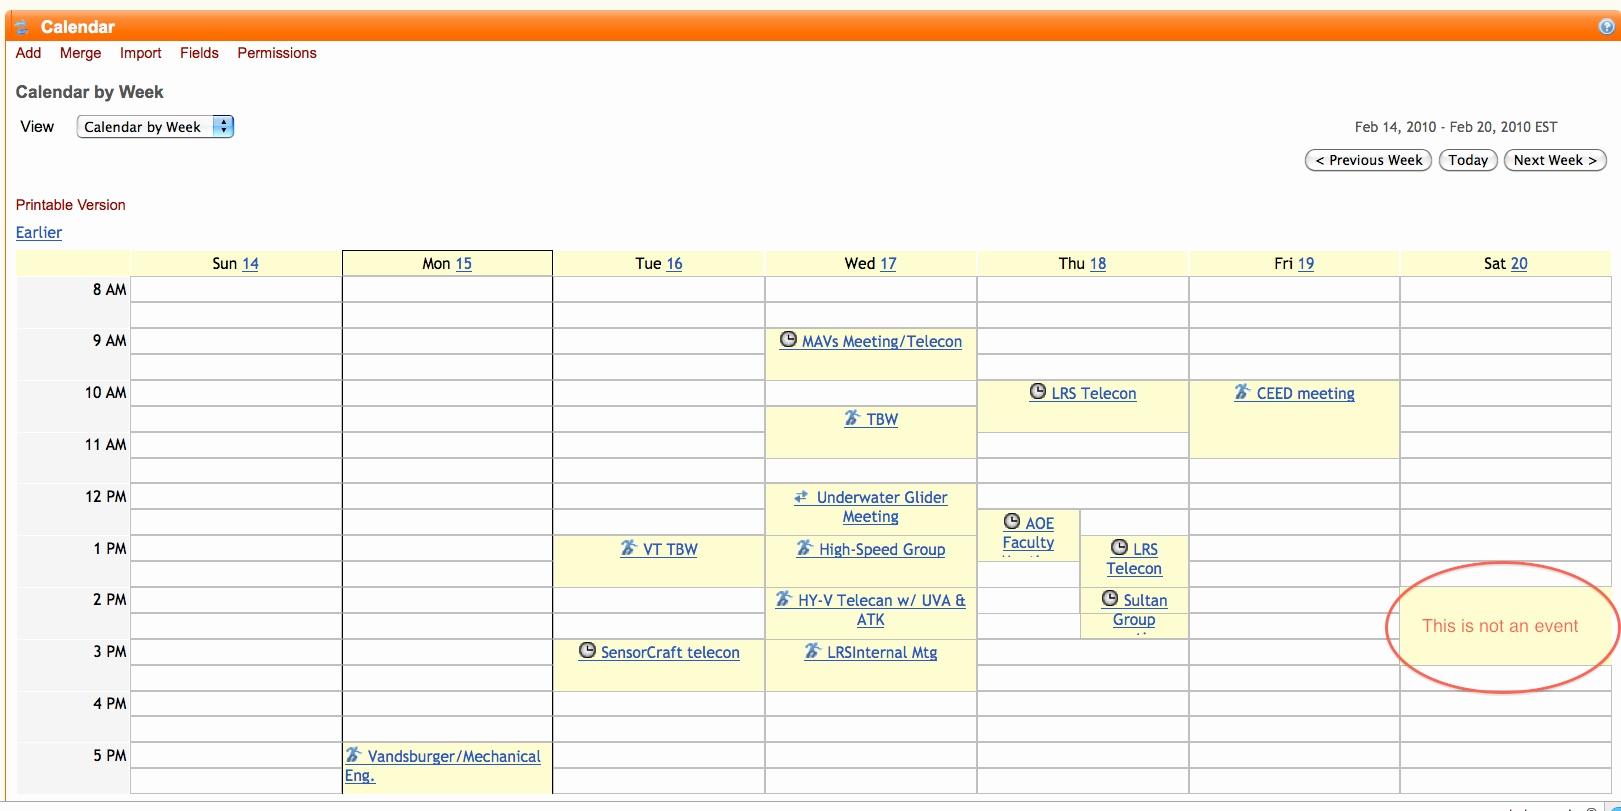 Weekly Calendar With Time Slots Printable Free Calendars 2016 With throughout Week Calendar With Time Slots